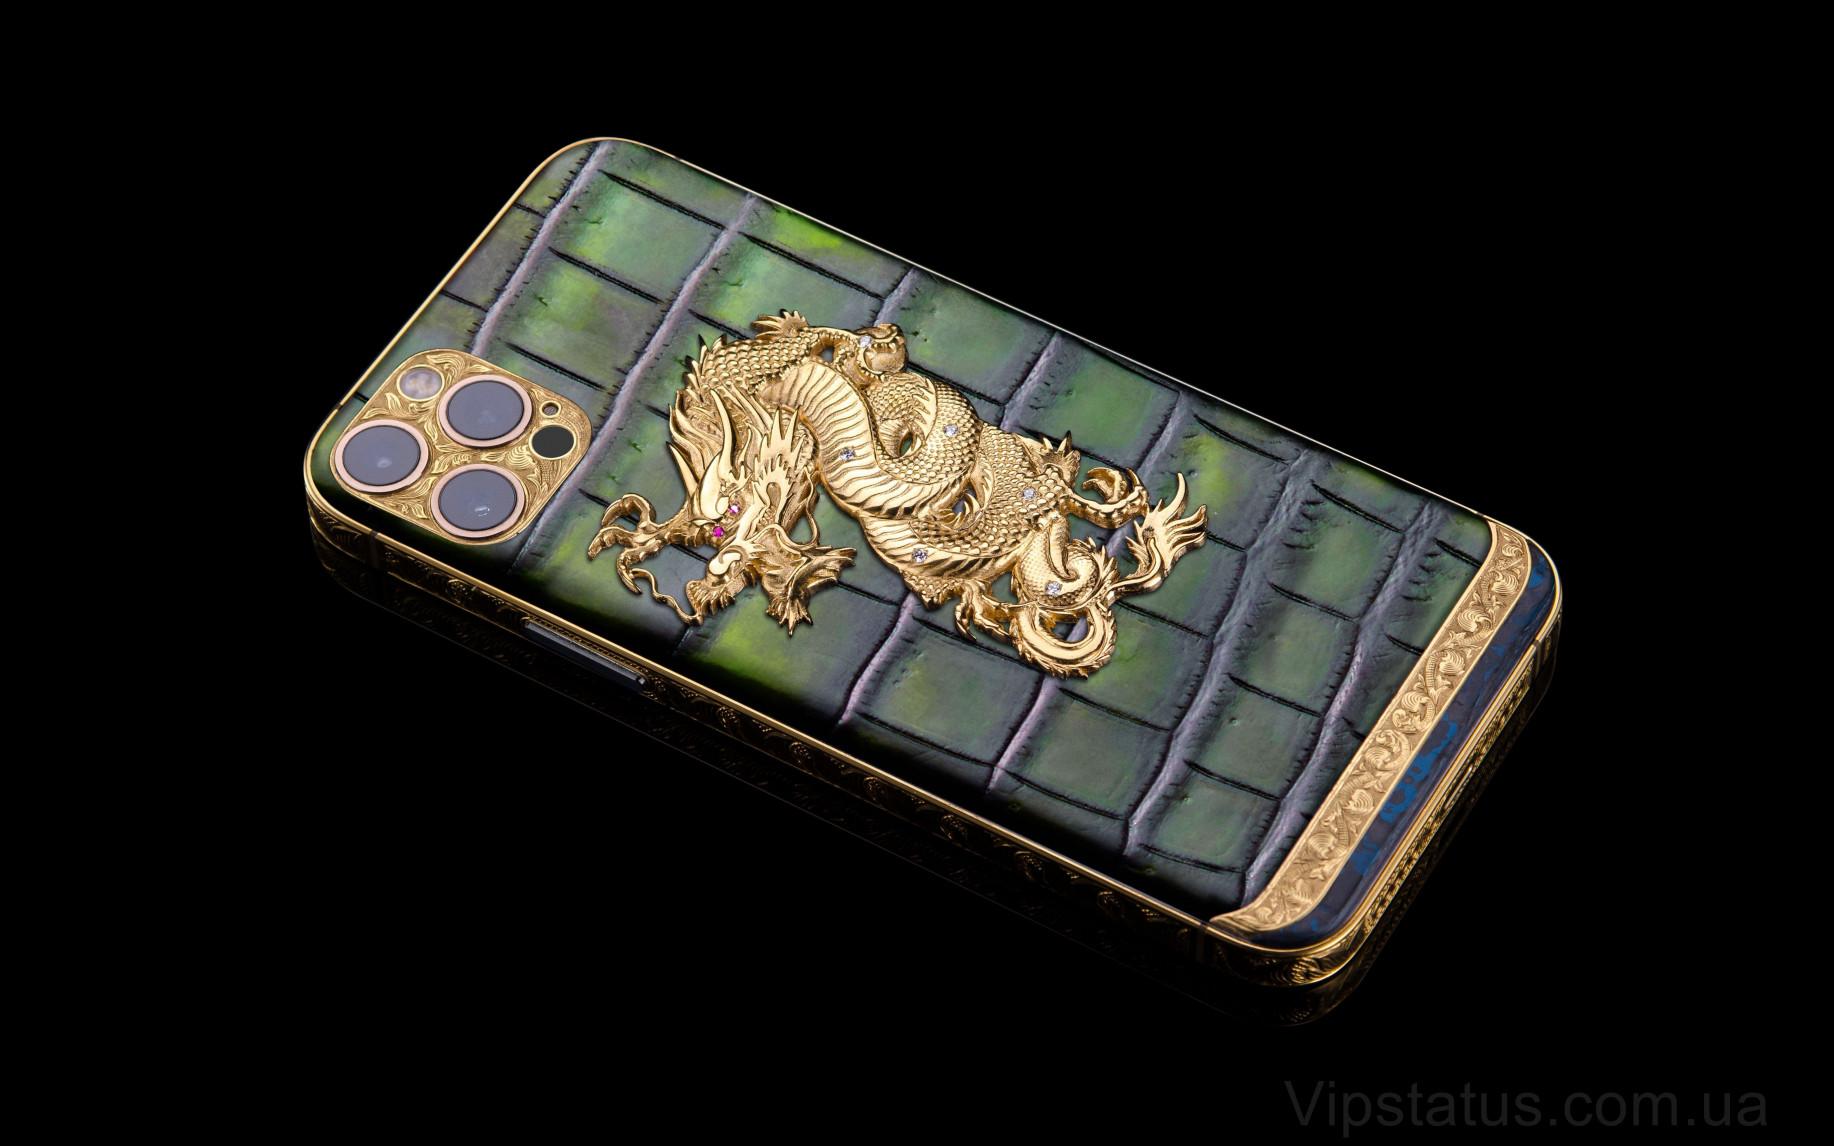 Elite Oriental Dragon IPHONE 12 PRO MAX 512 GB Oriental Dragon IPHONE 12 PRO MAX 512 GB image 17